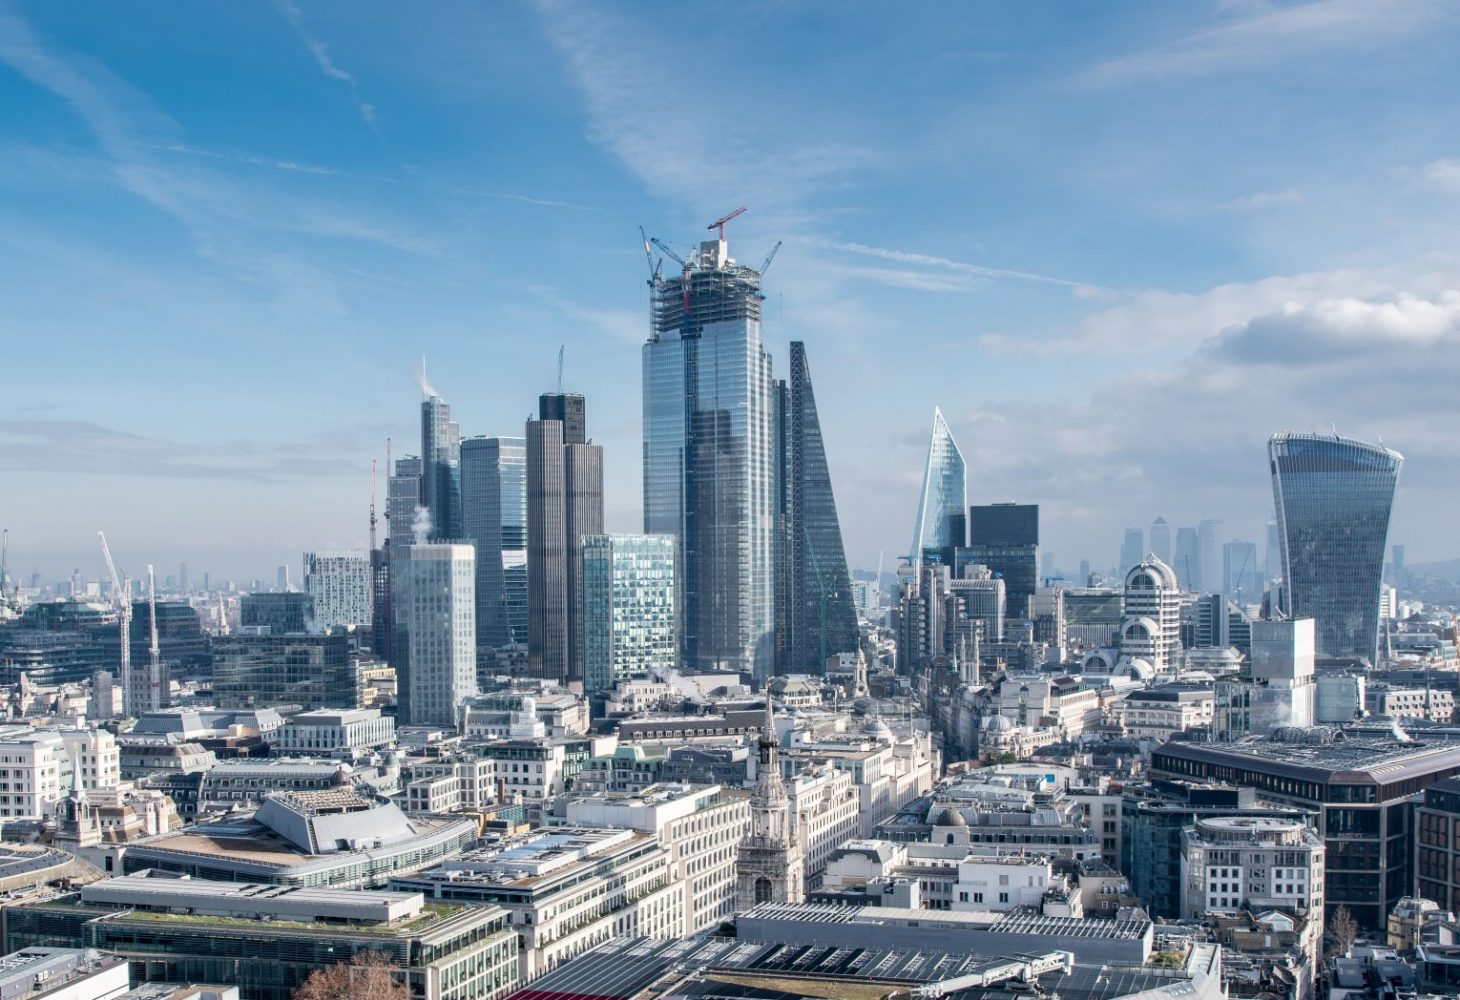 City of London urban skyline